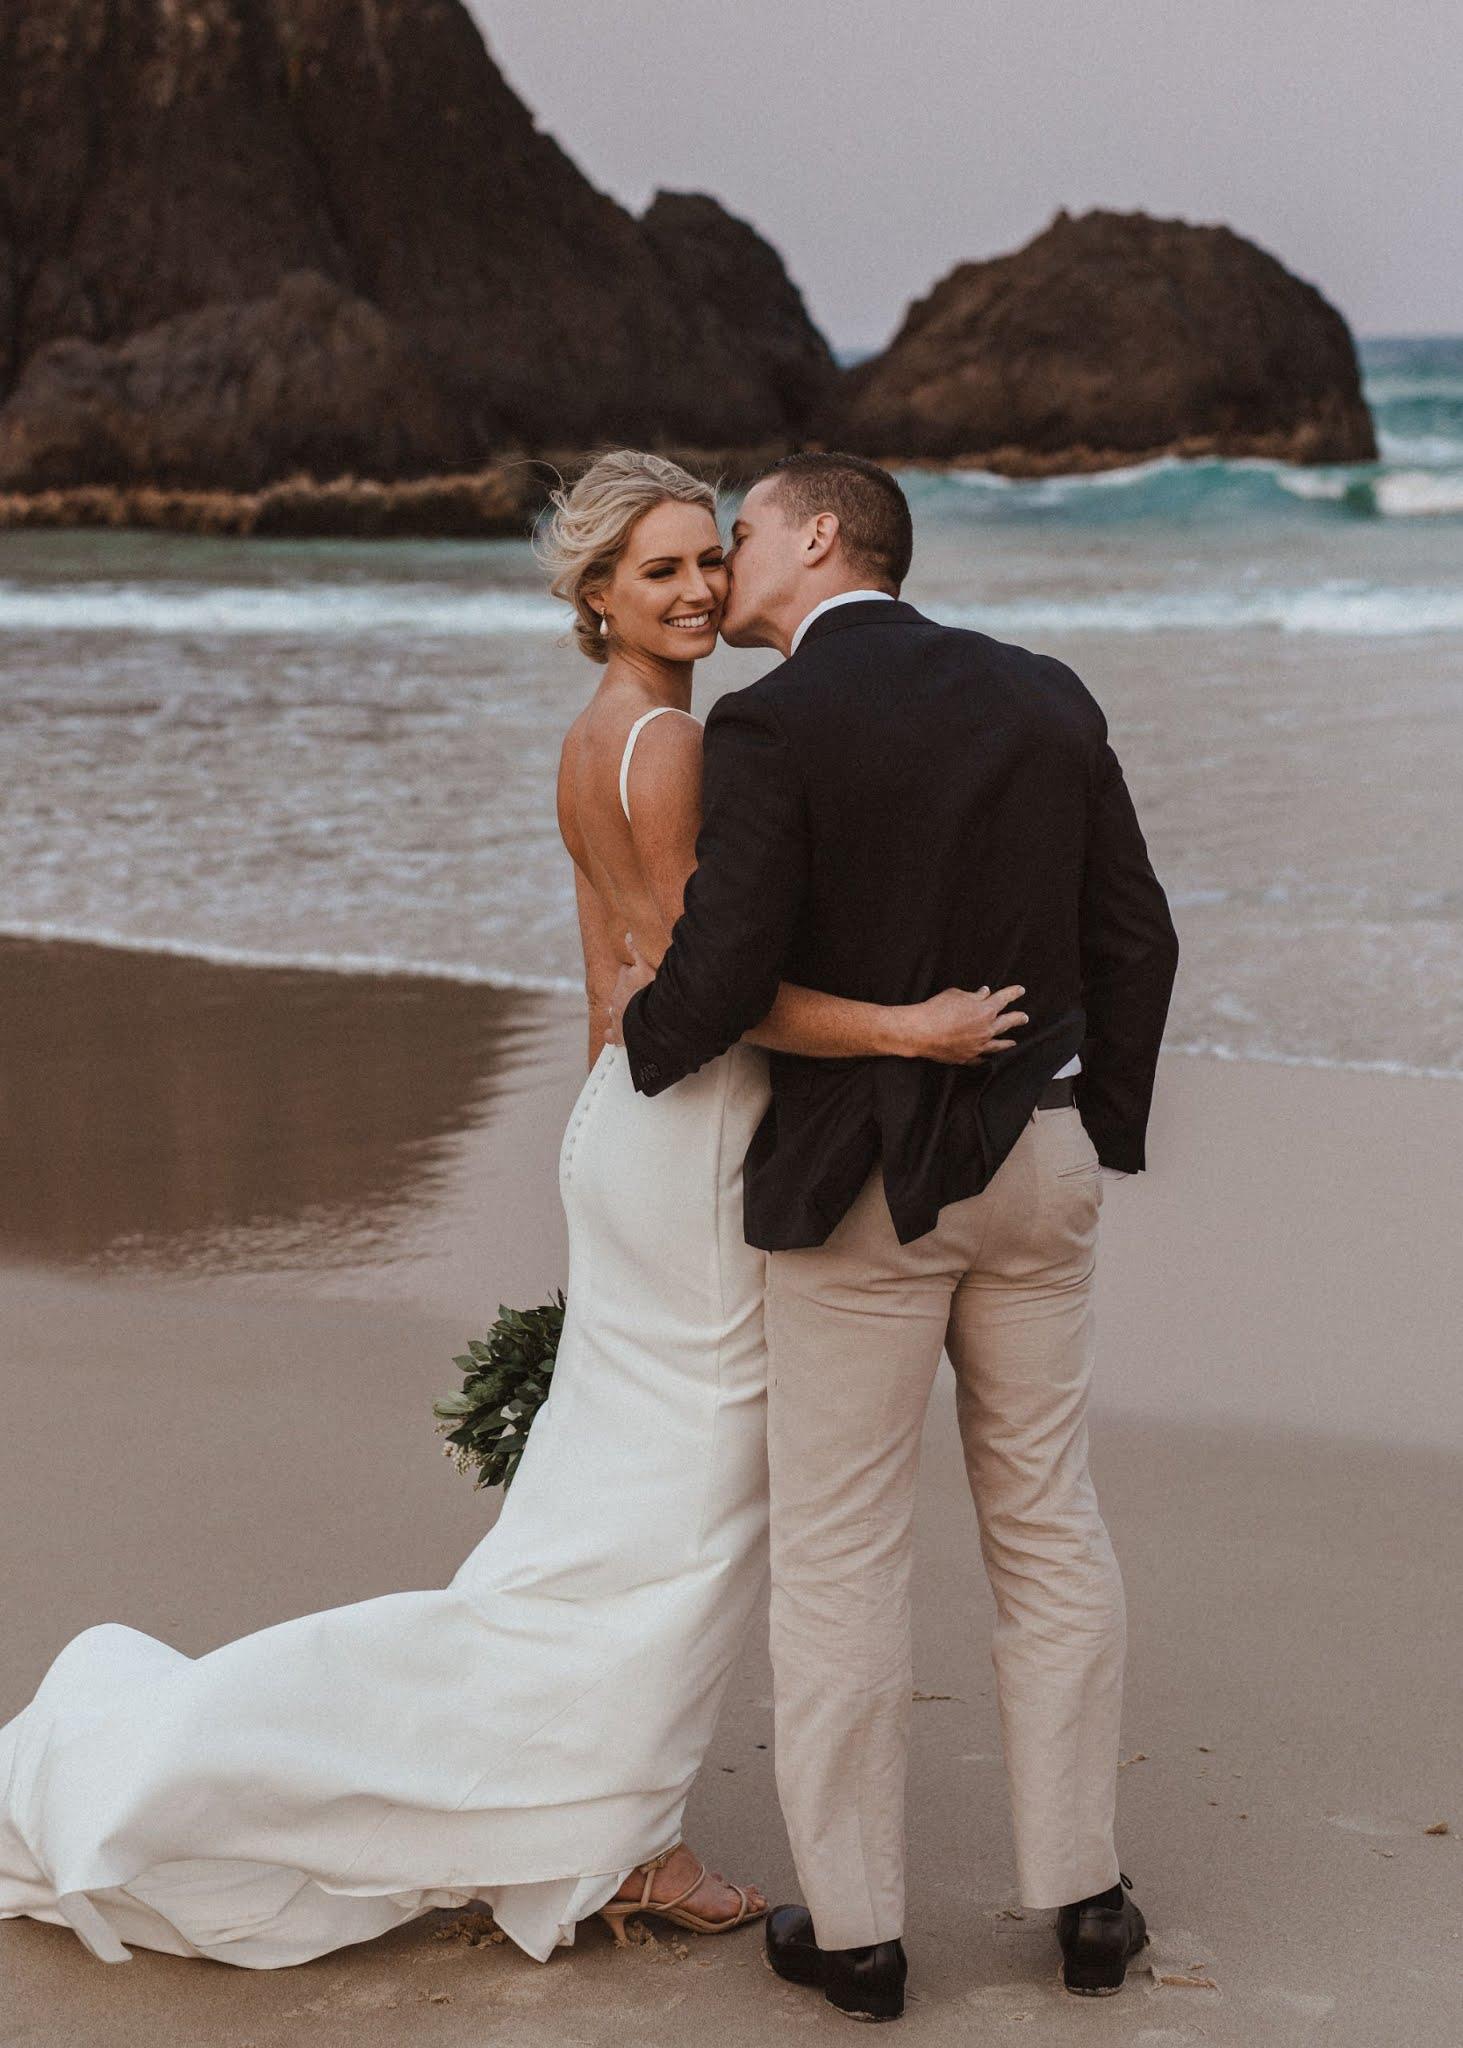 nathan lapham real weddings australia